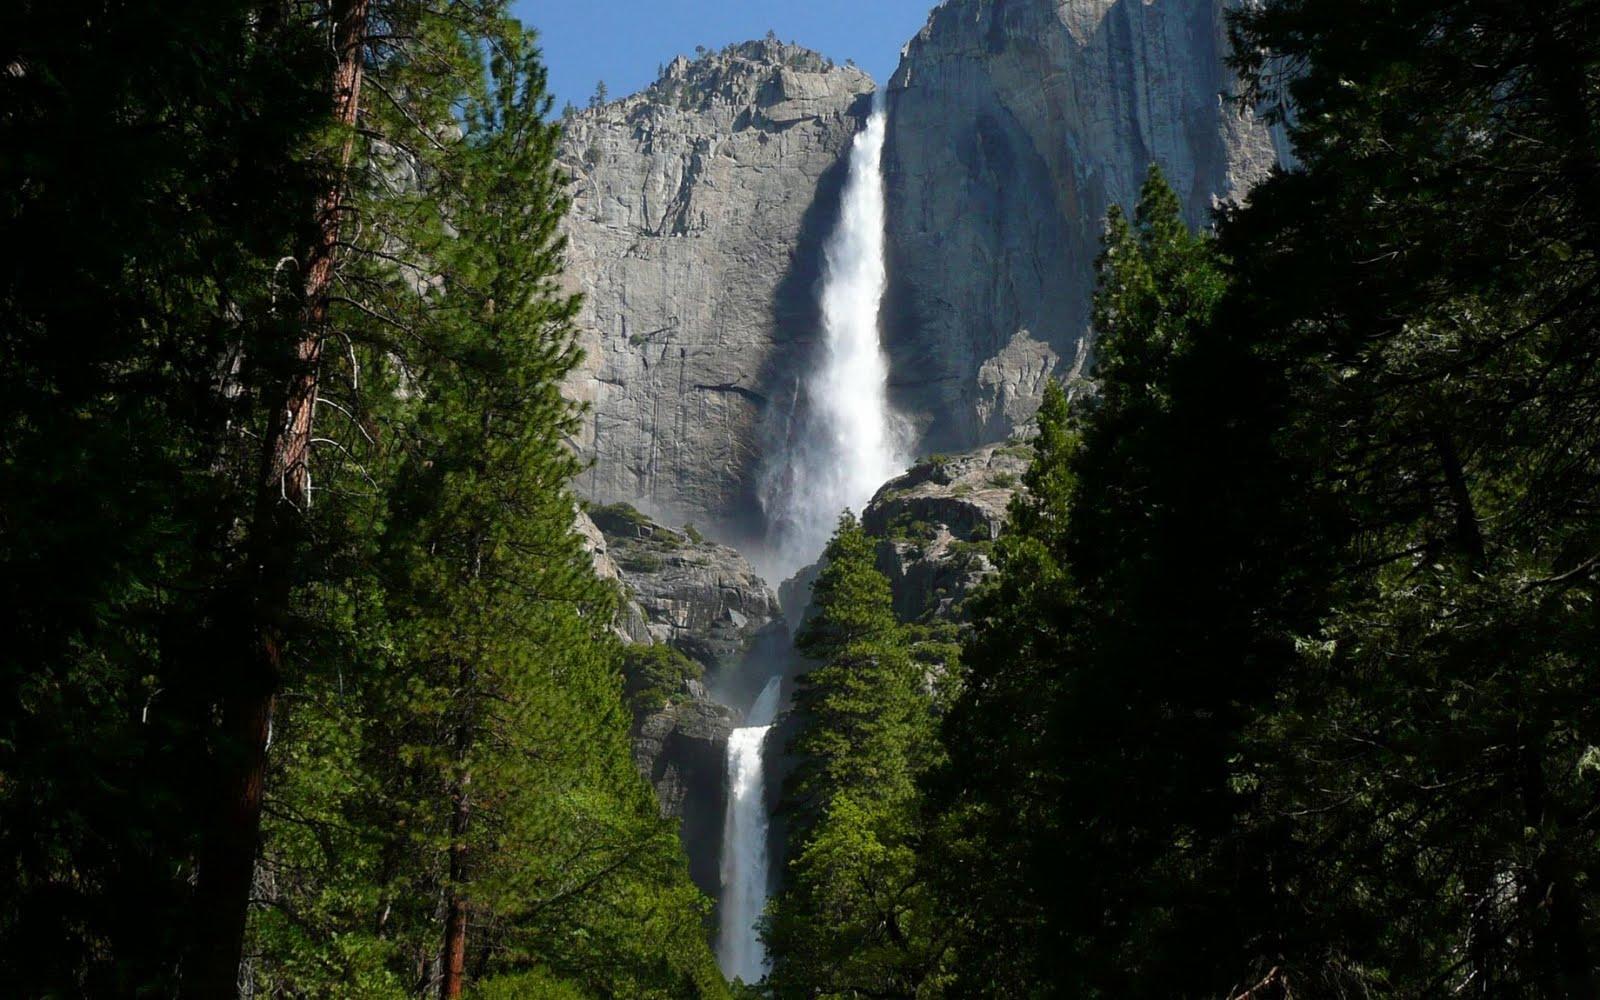 http://4.bp.blogspot.com/_HzAThb2RgMc/TLydLksfnJI/AAAAAAAABzk/en8YH6oTaKA/s1600/Yosemite_Falls_1680+x+1050+widescreen.jpg